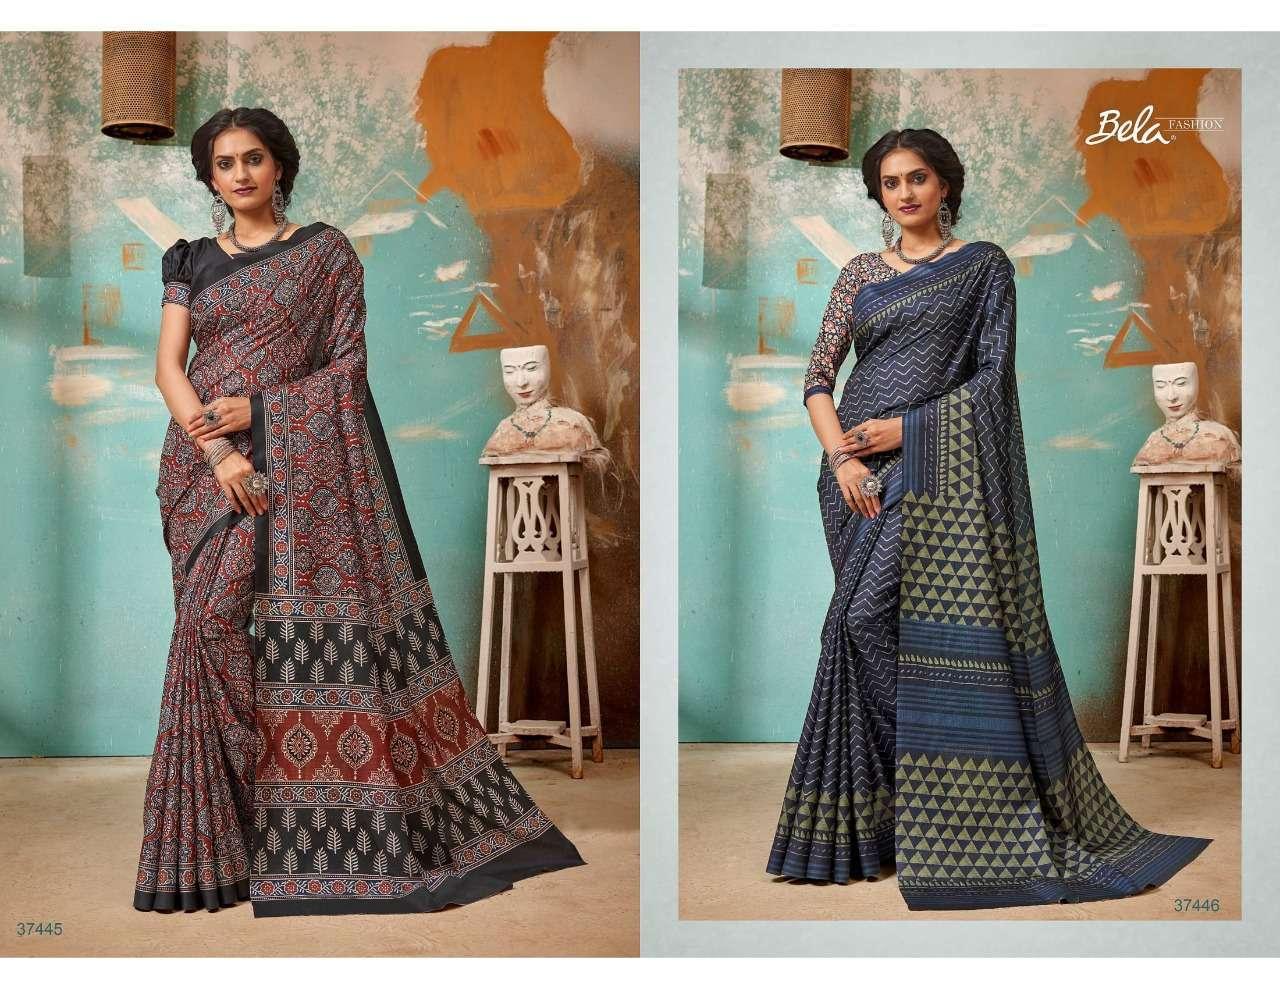 Bela Fashion Tulsi Khadi Silk With Digital Print Sarees Collection 04